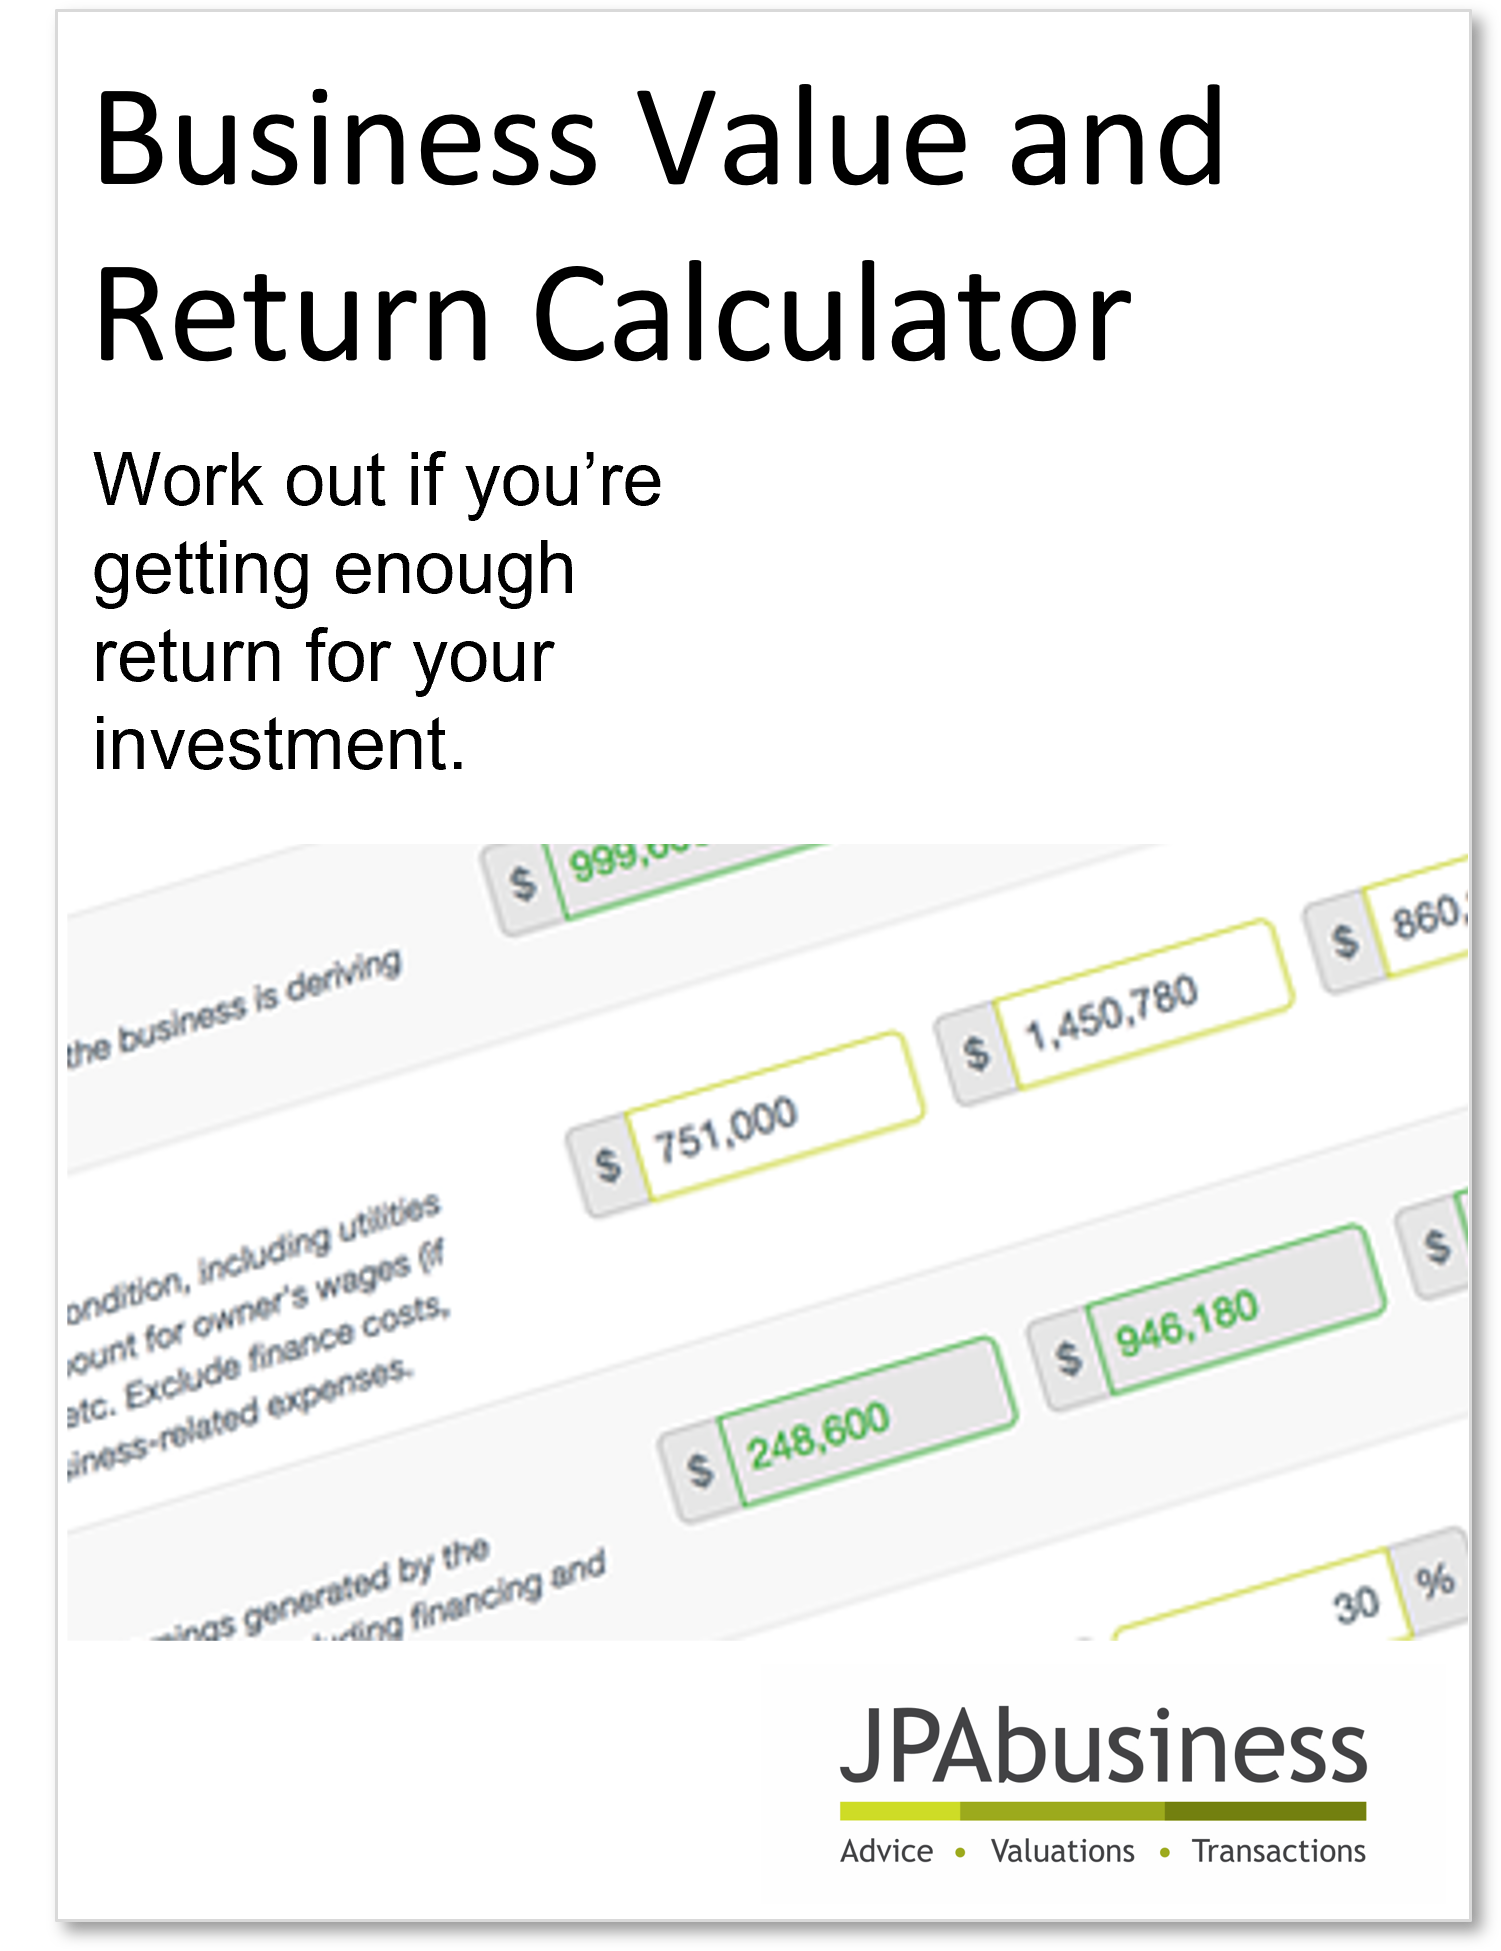 Business value calculator